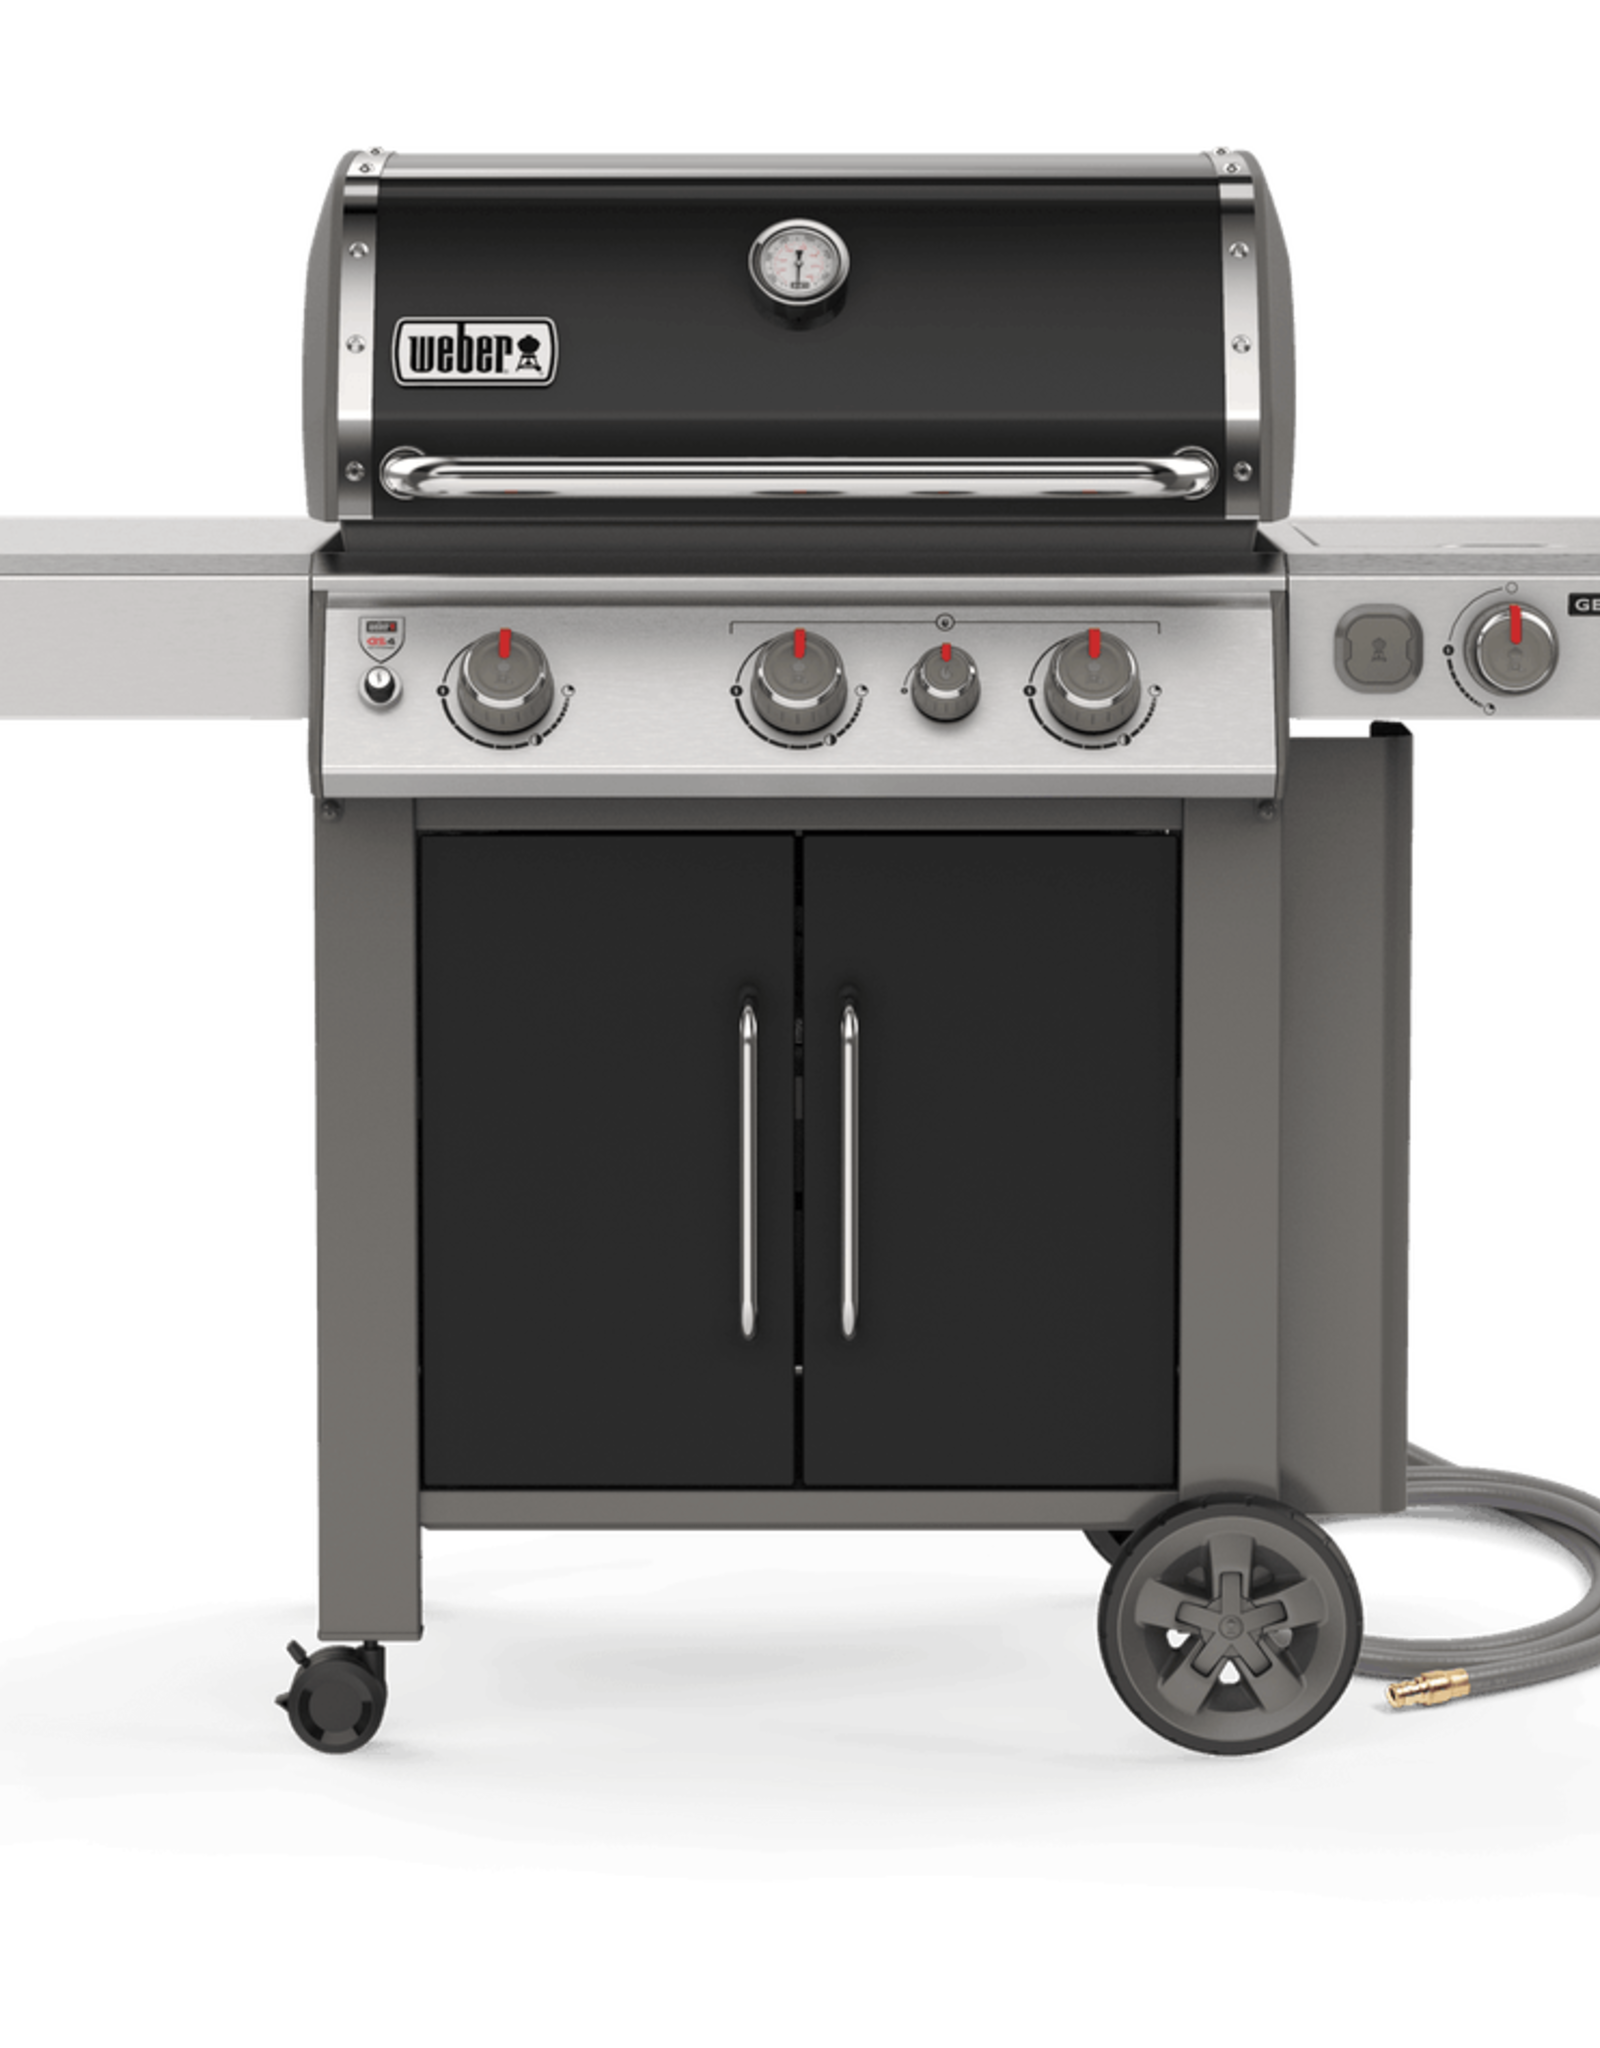 Weber Genesis II Smart Grill EX-335 NG Black